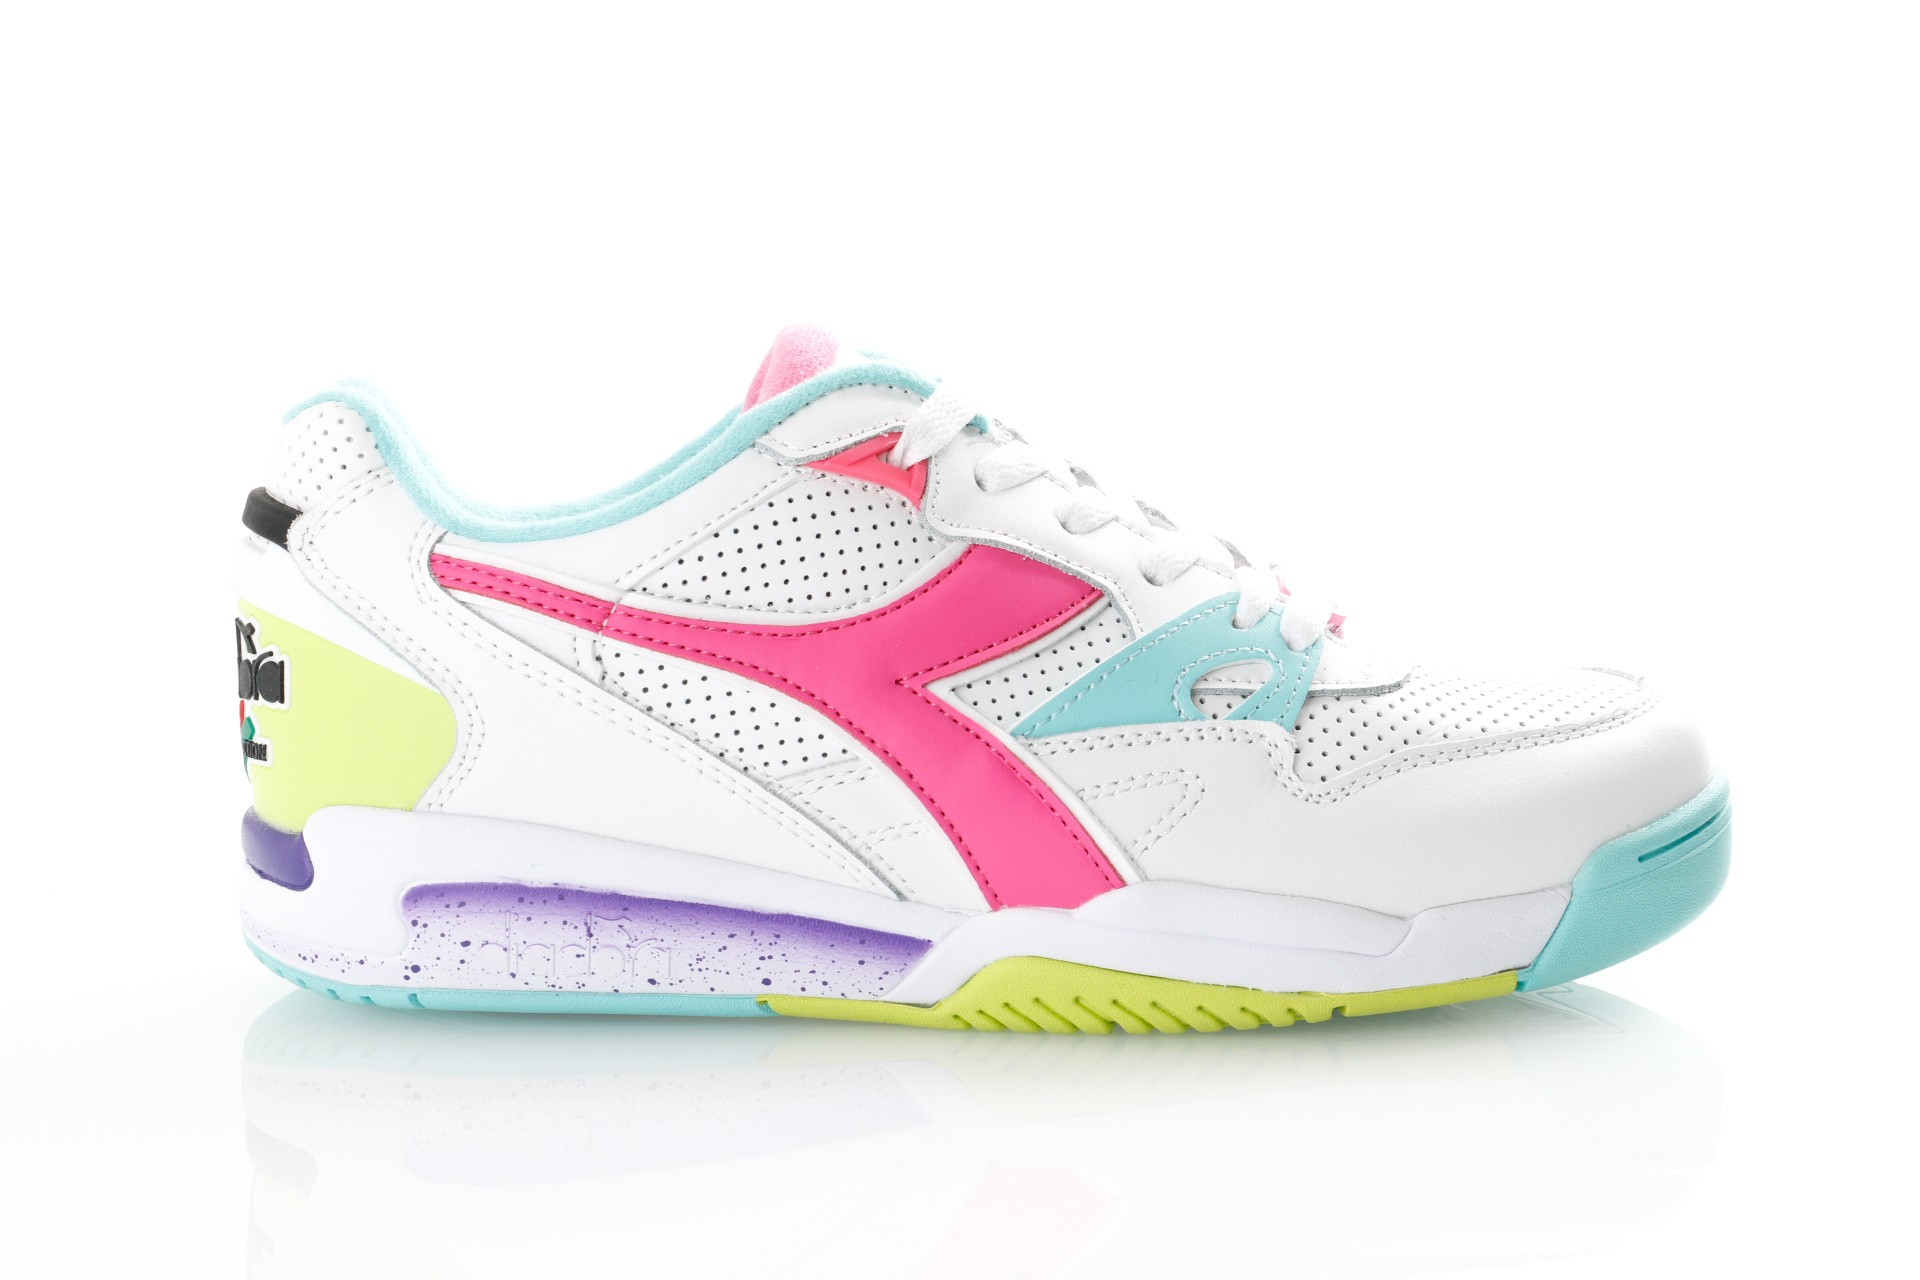 Foto van Diadora Rebound Ace 501173079 Sneakers White / Aruba Blue